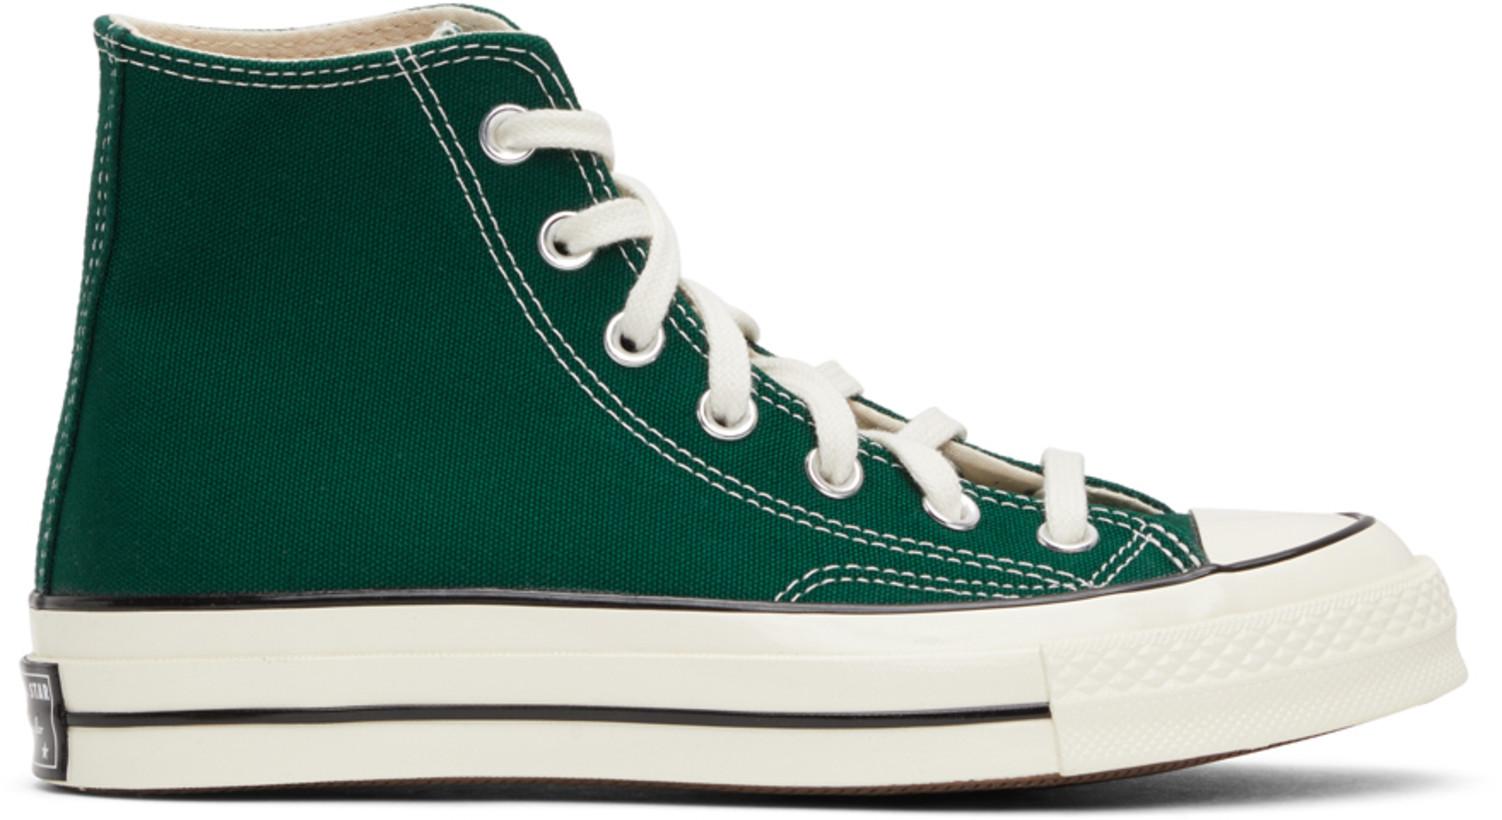 Converse グリーン Seasonal Color Chuck 70 ハイ スニーカー メンズ ¥10500 JPY